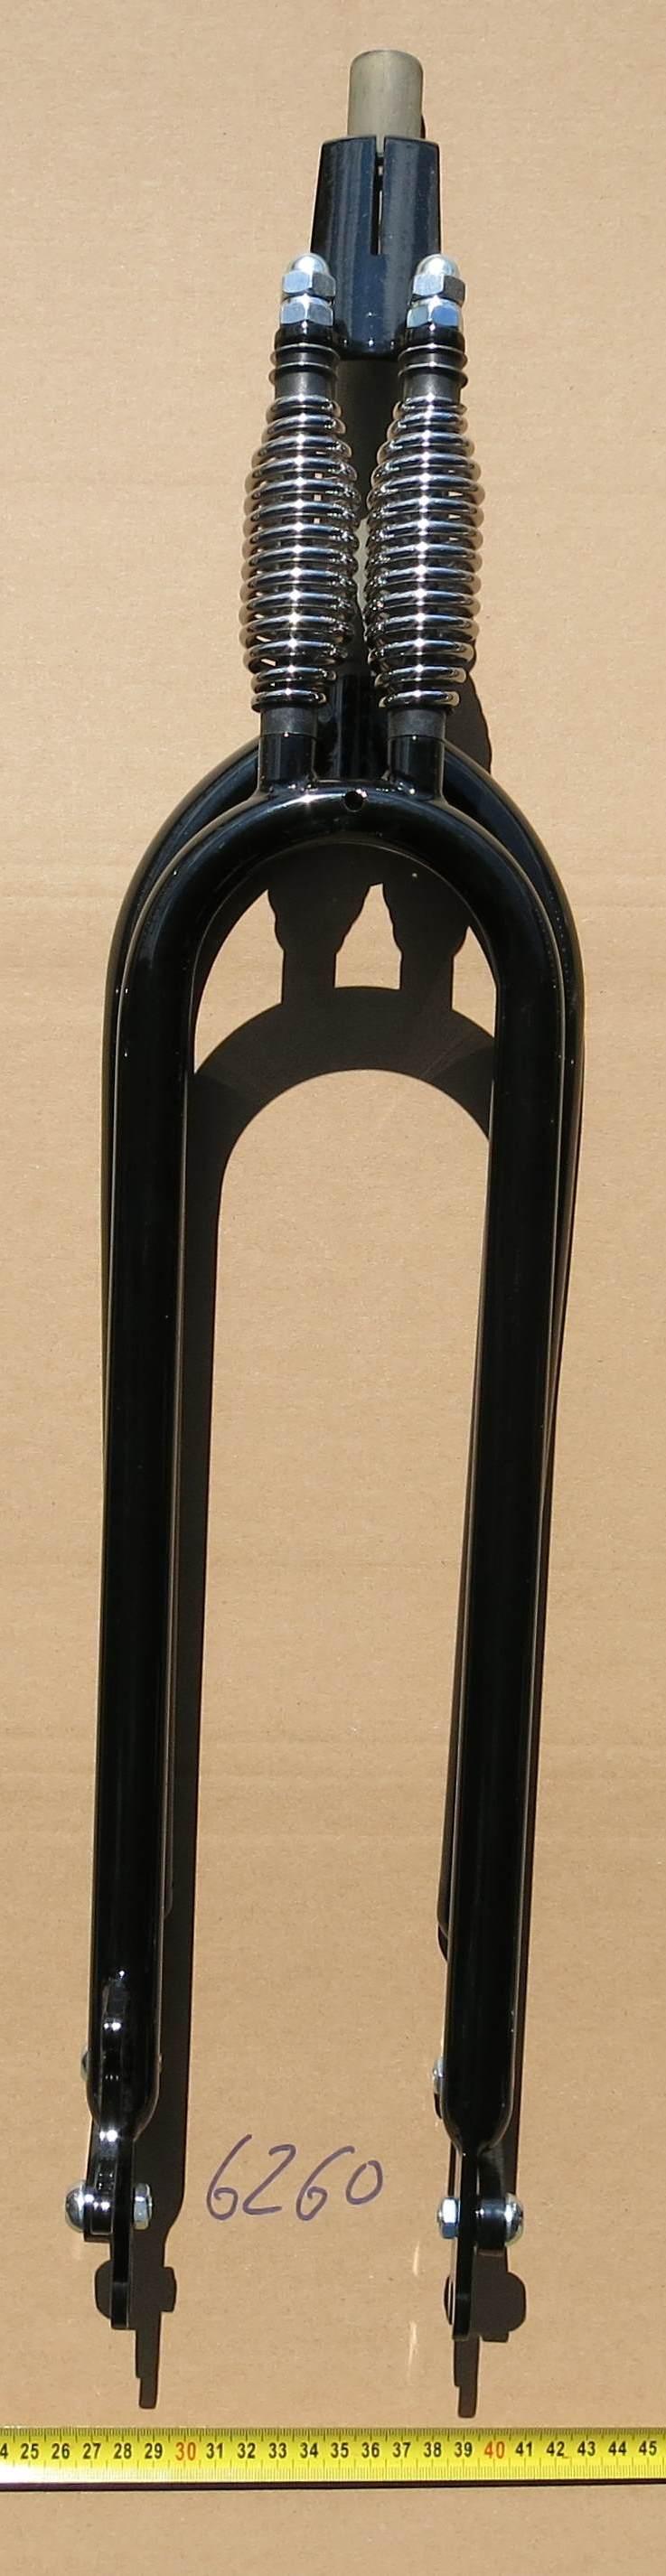 Вилка Dual Springer Vintage 28 дюймов